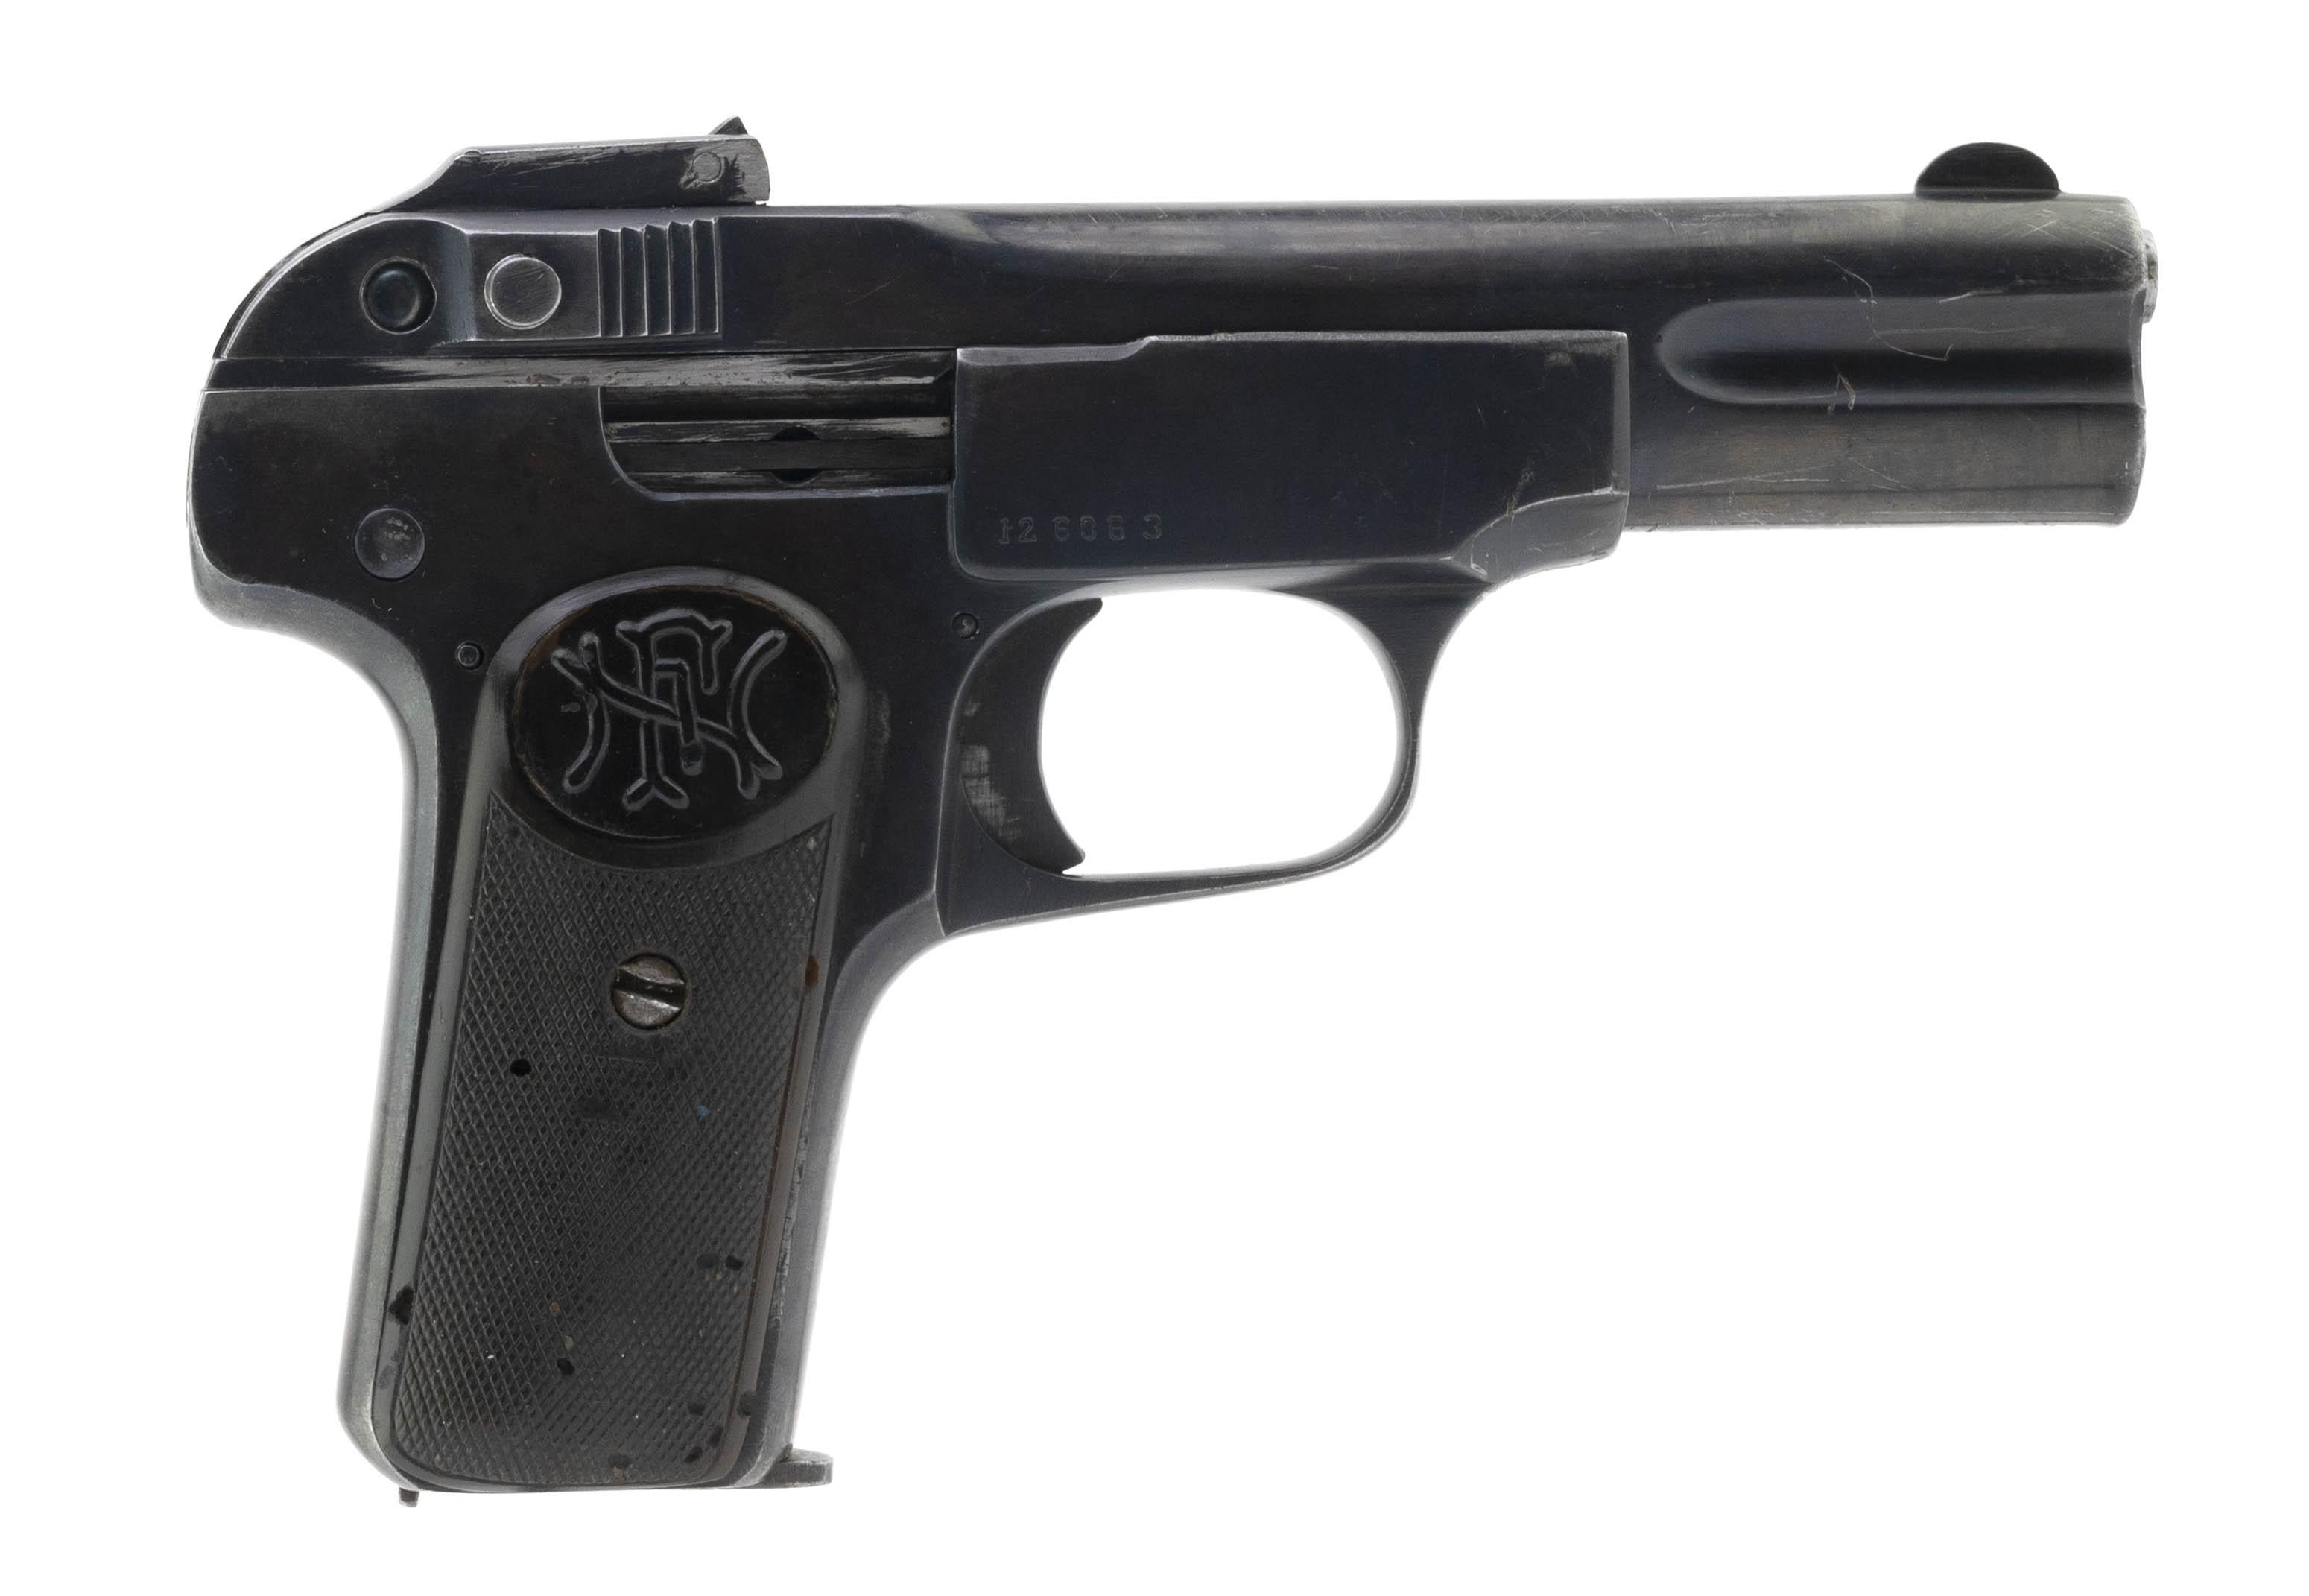 FN BROWNING , MODEL: 1900 , CALIBER: 32 ACP